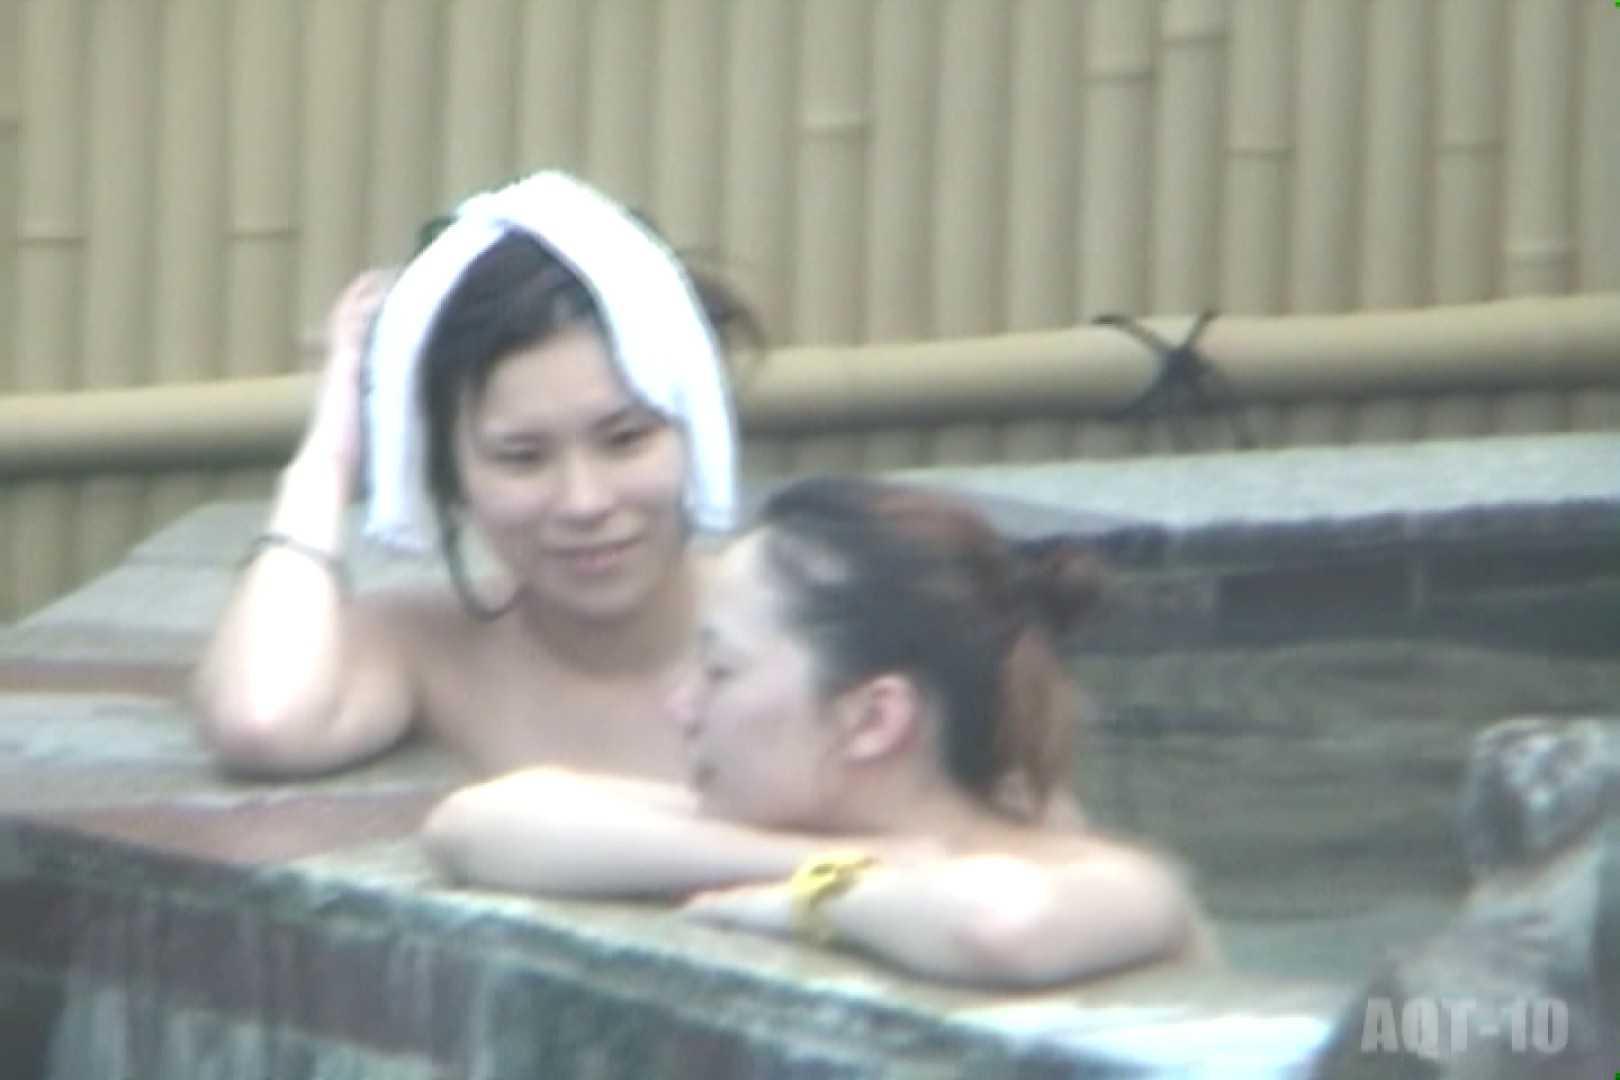 Aquaな露天風呂Vol.792 盗撮   HなOL  103pic 74